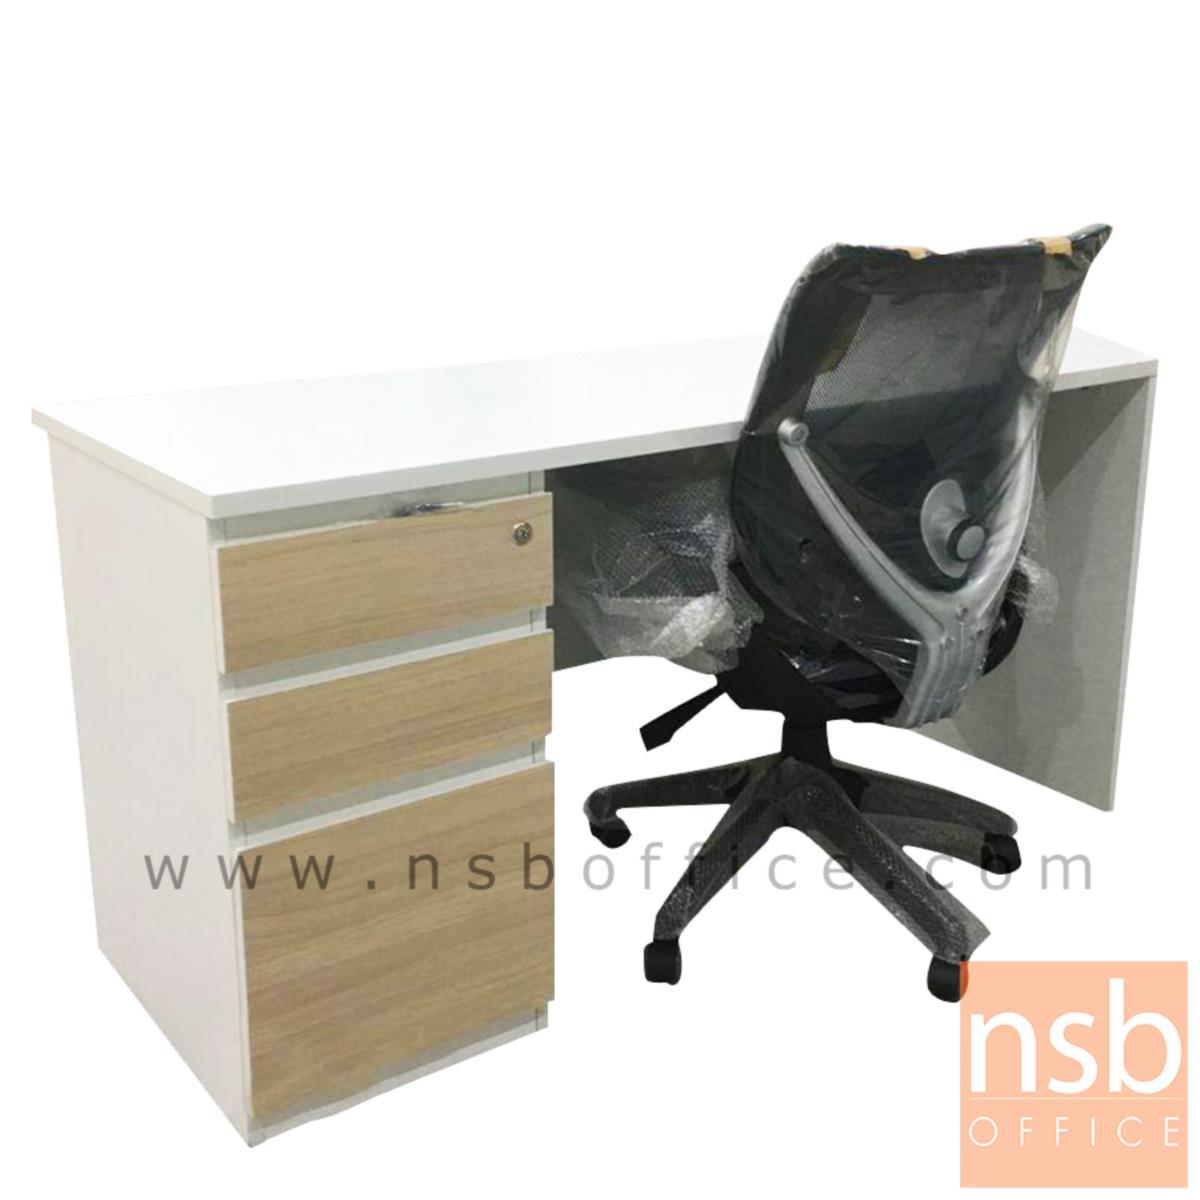 A13A201:โต๊ะทำงาน 3 ลิ้นชักบานเพ่  ขนาด 100W ,120W ,135W ,150W cm.  เมลามีน